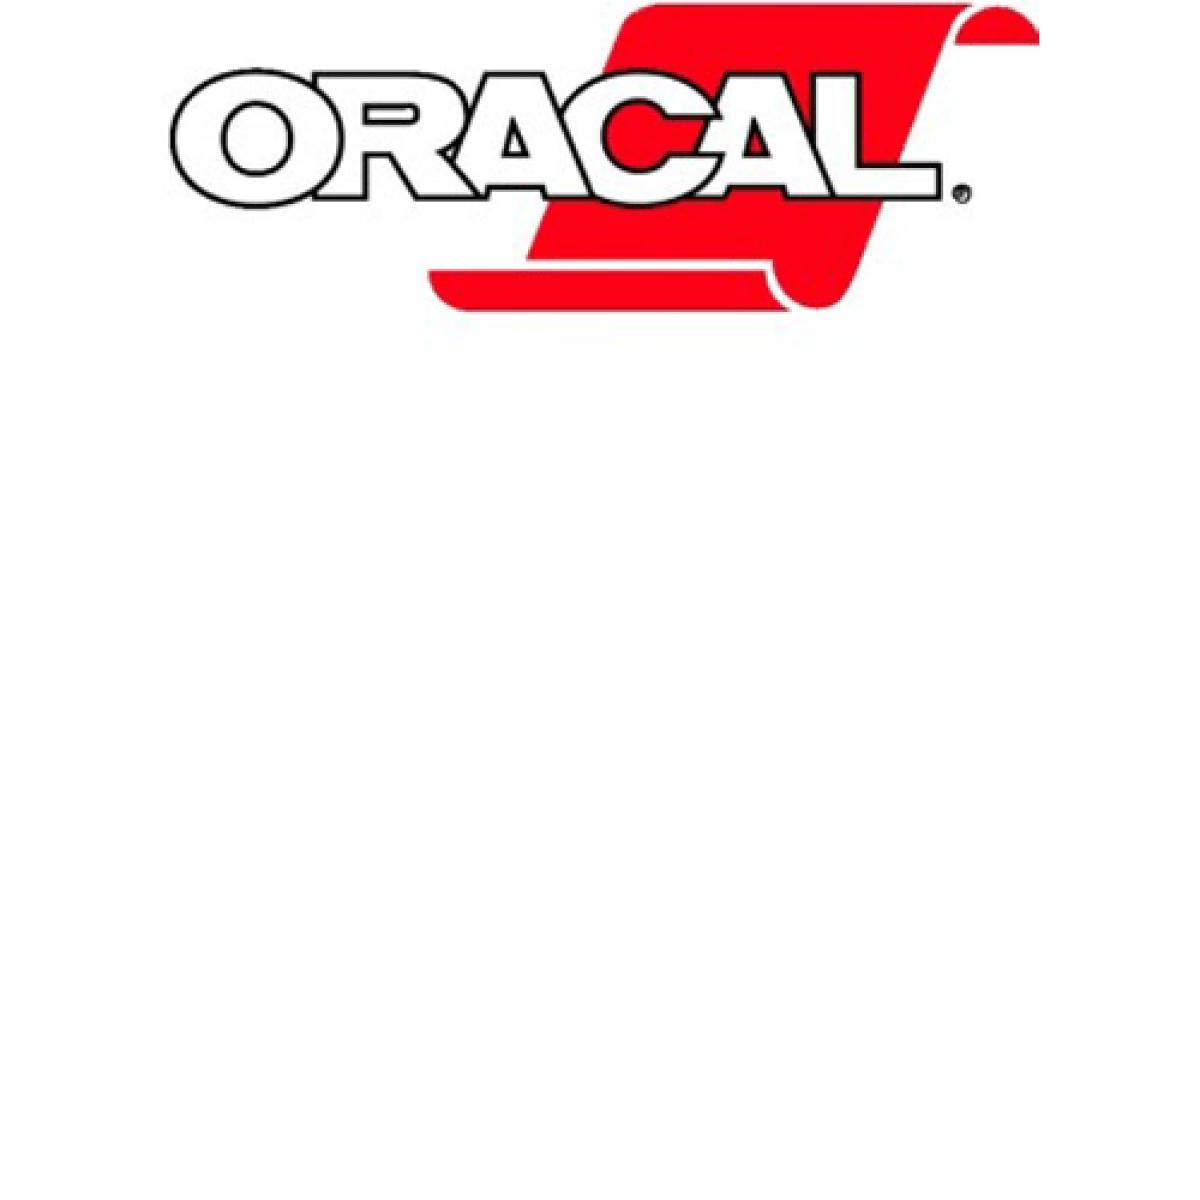 oracal_small